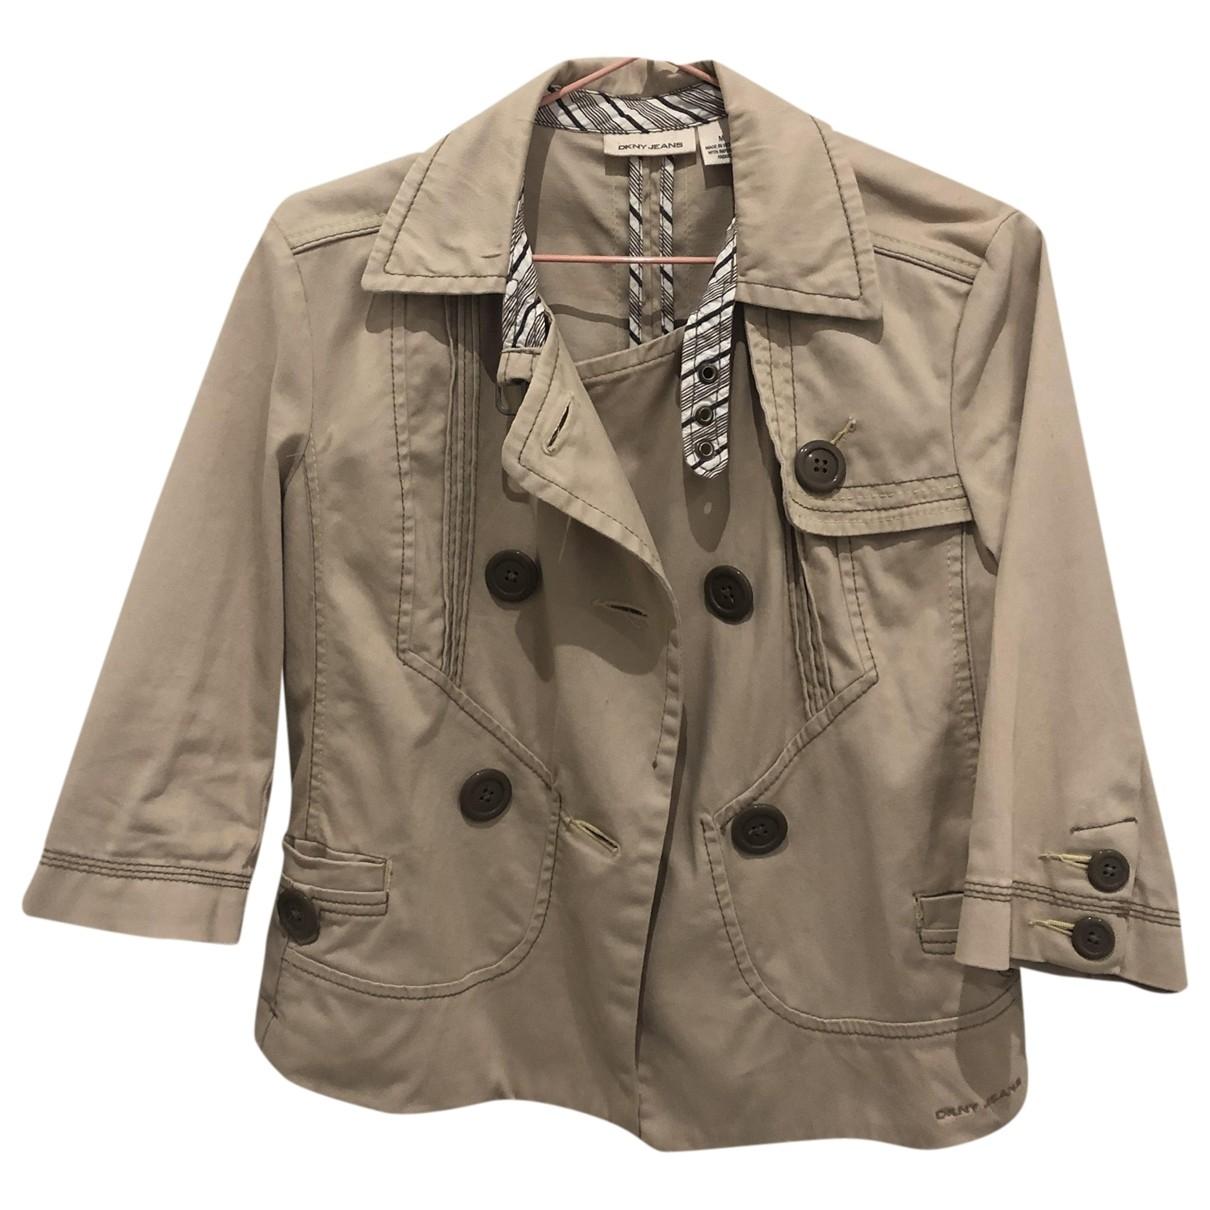 Dkny \N Khaki Cotton jacket for Women M International